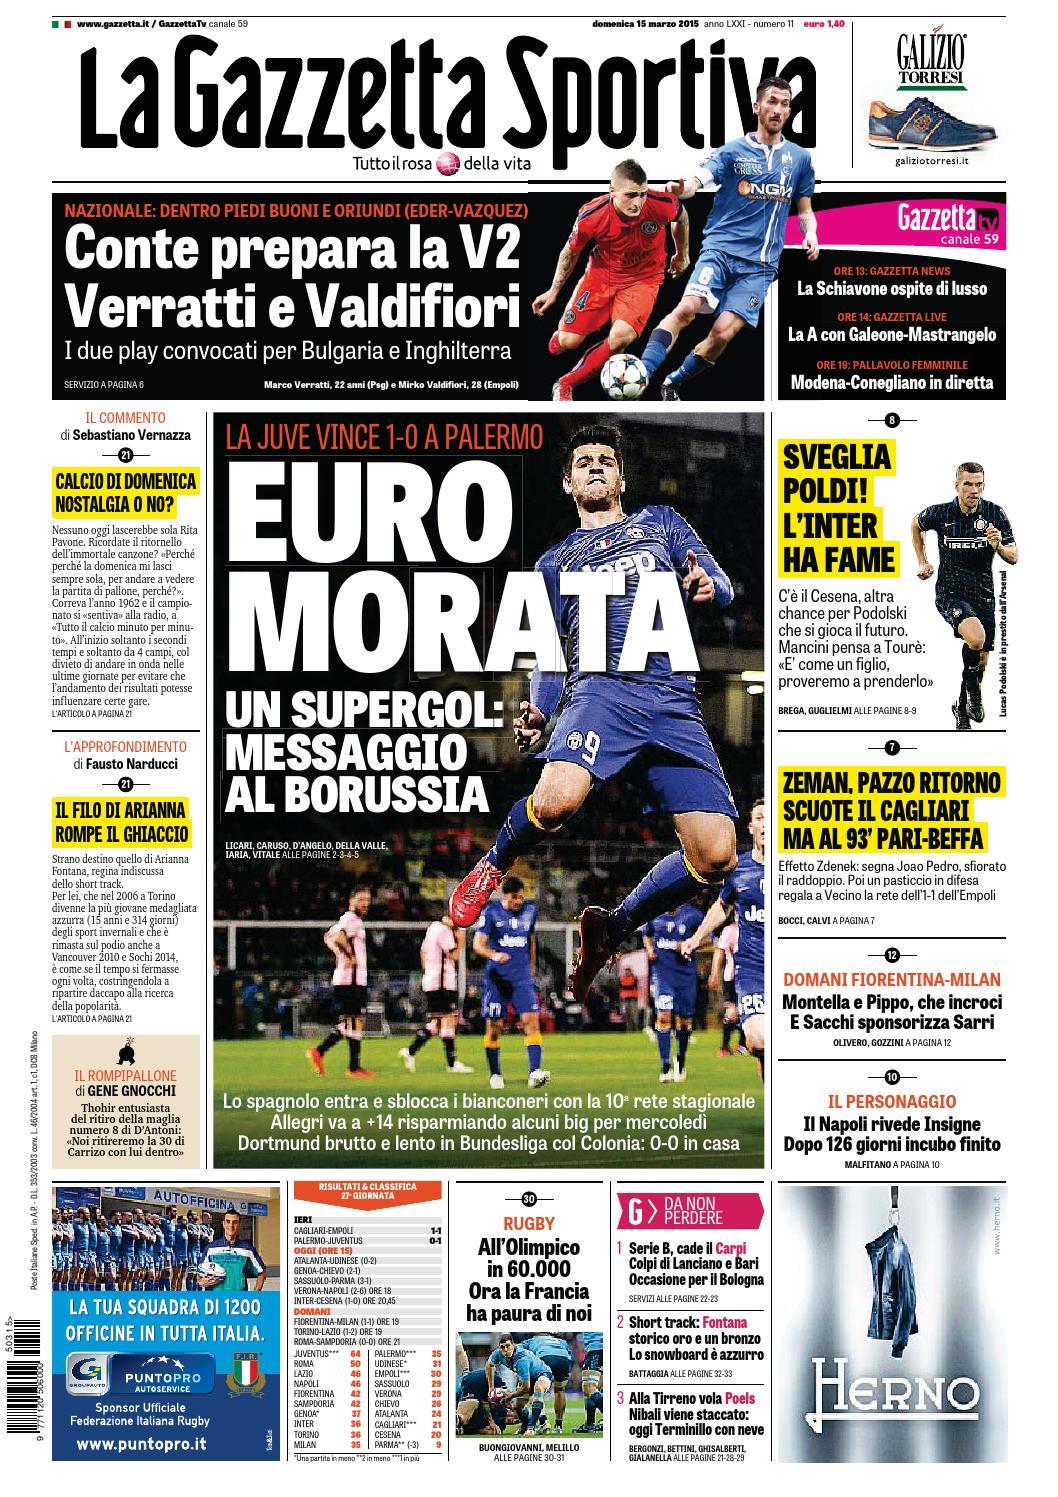 La Gazzetta dello Sport (03-15-2015) by Nguyen Duc Thinh - issuu 3bf086d63951